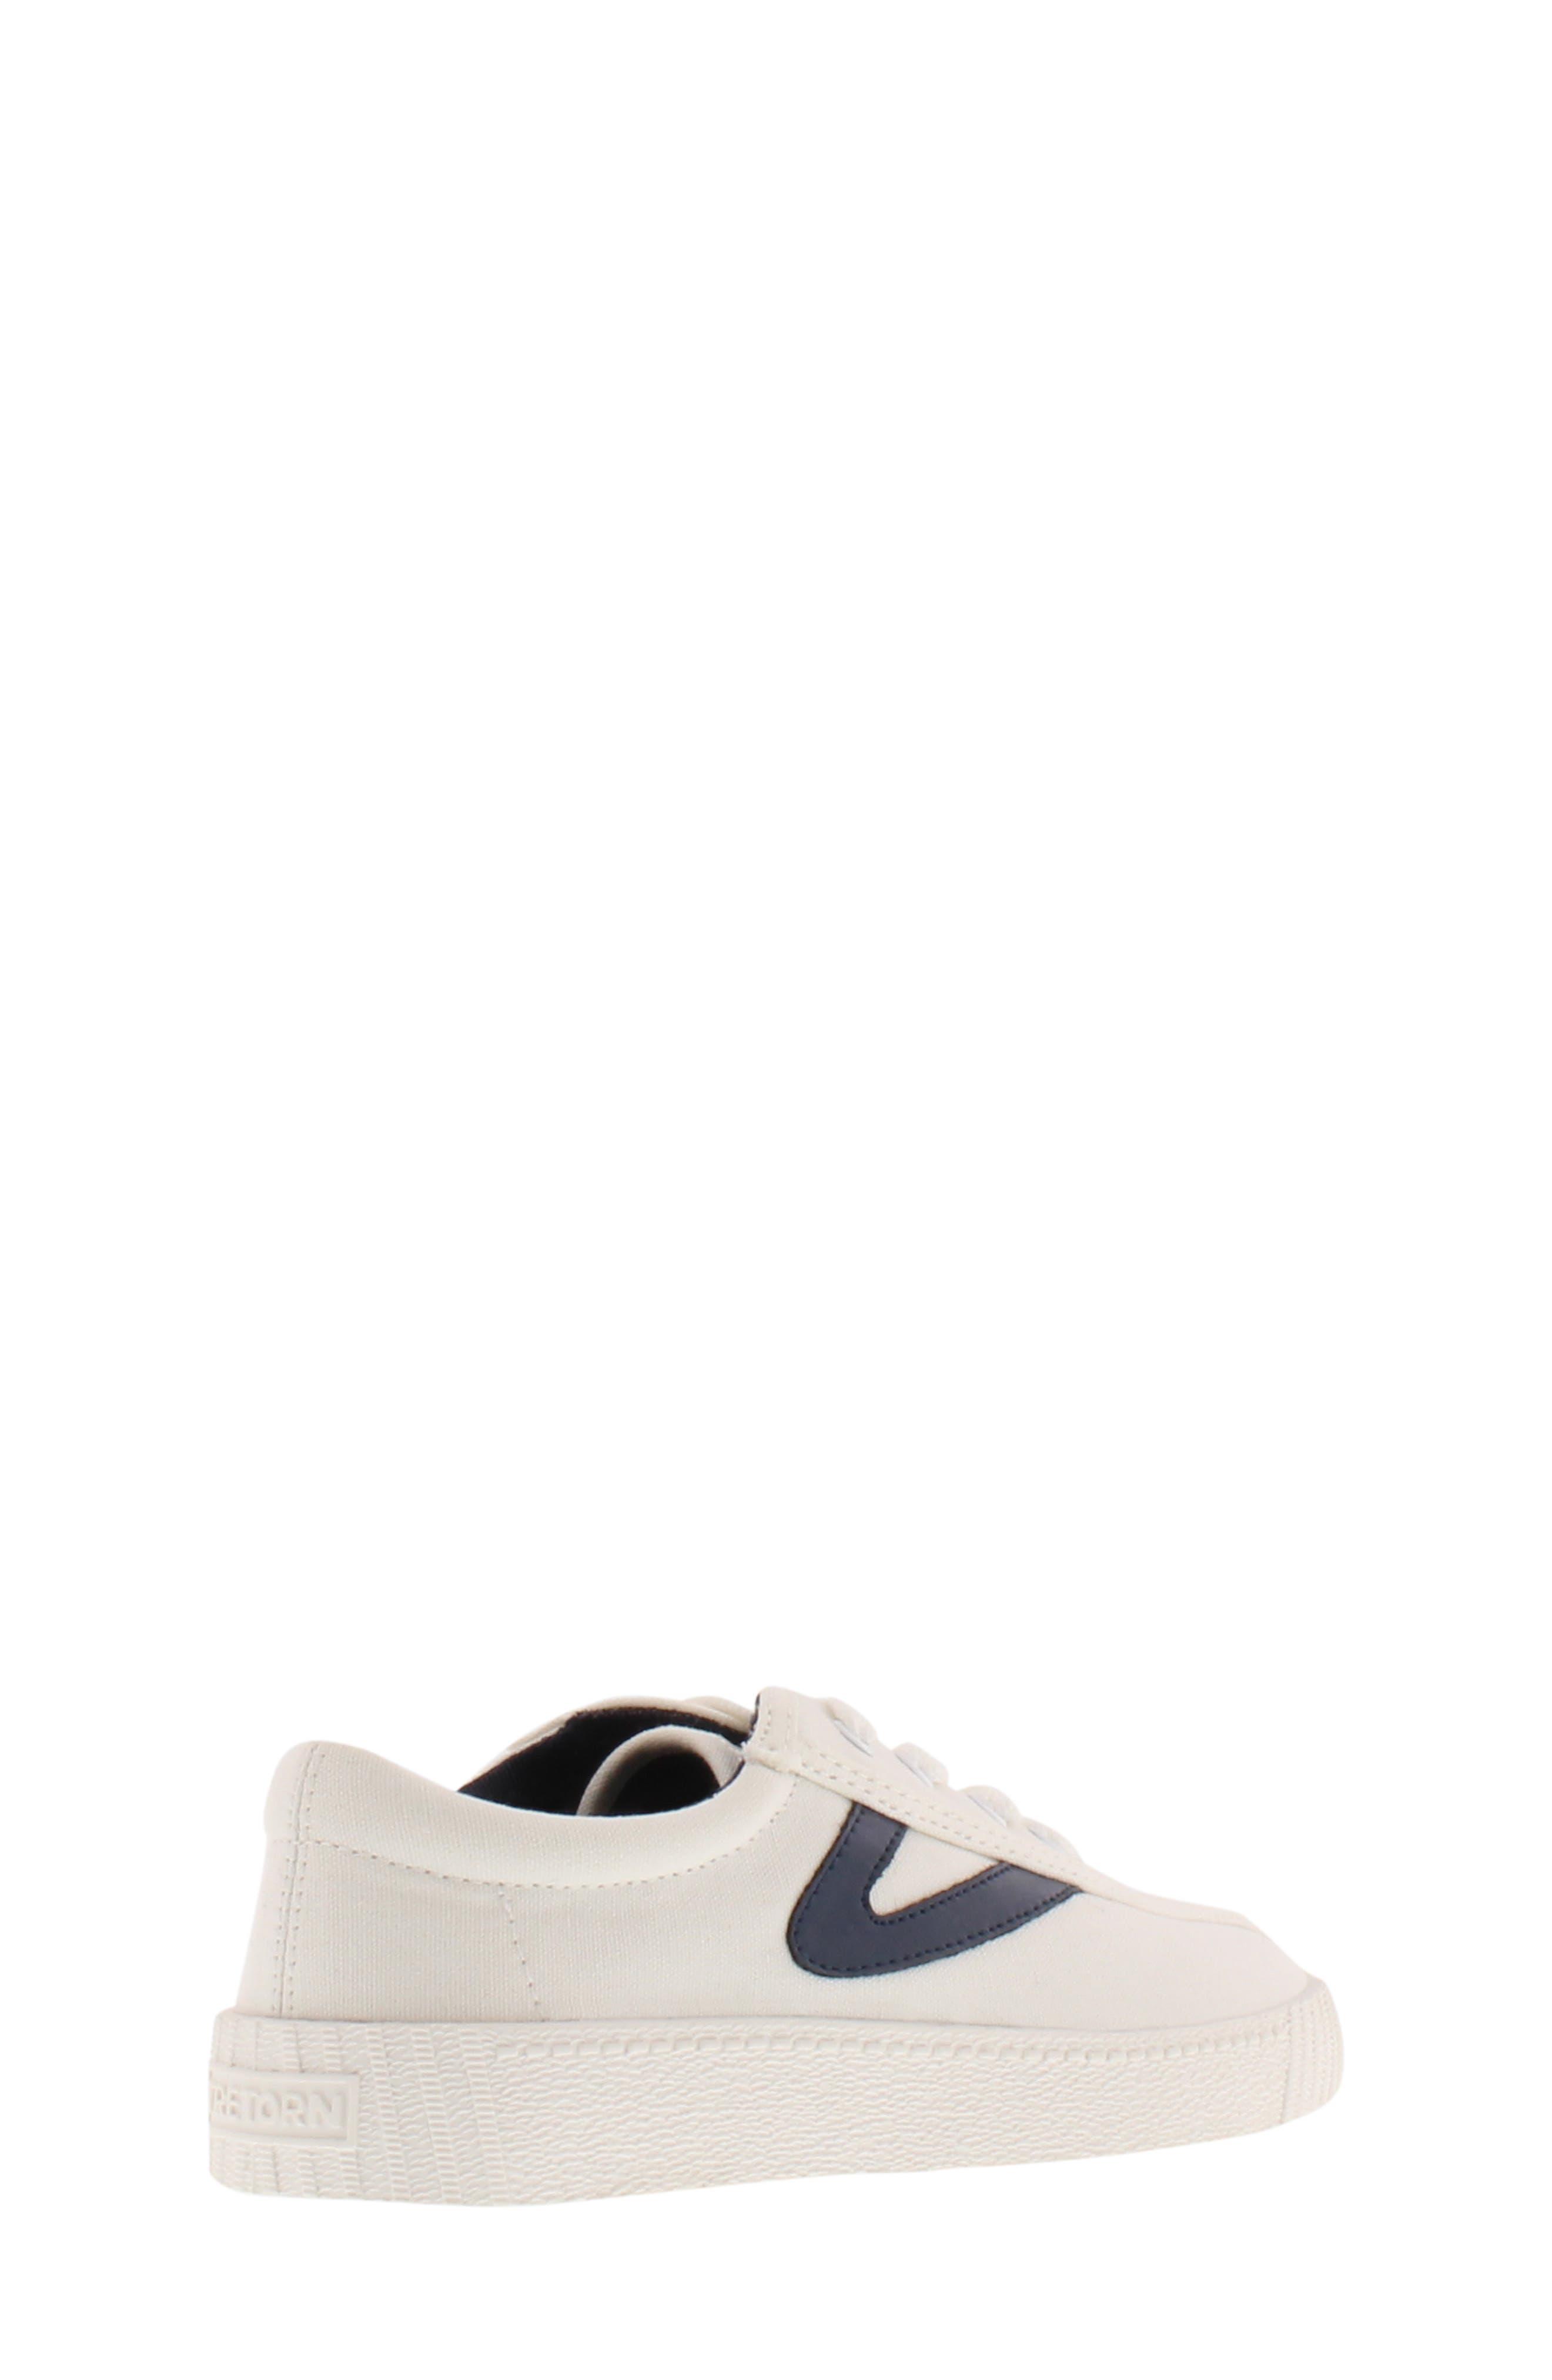 Nylite Plus Sneaker,                             Alternate thumbnail 2, color,                             WHITE/ NIGHT